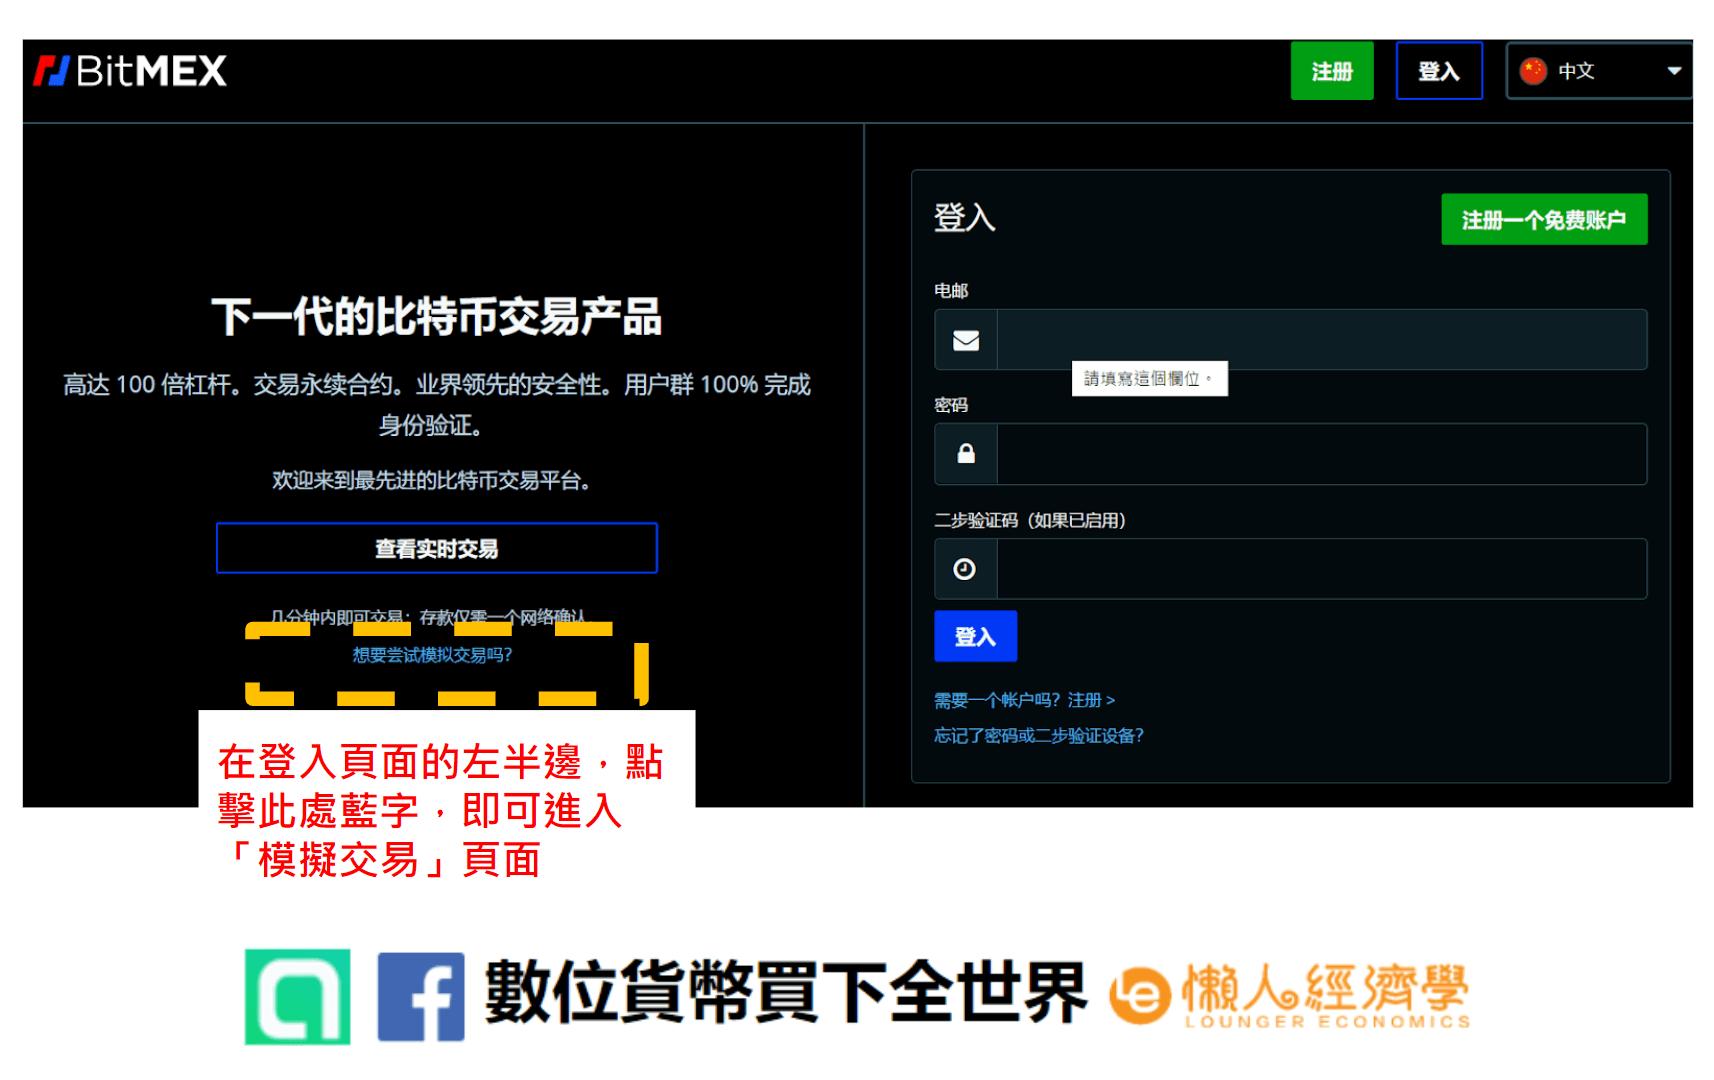 BitMEX交易所的模擬交易倉